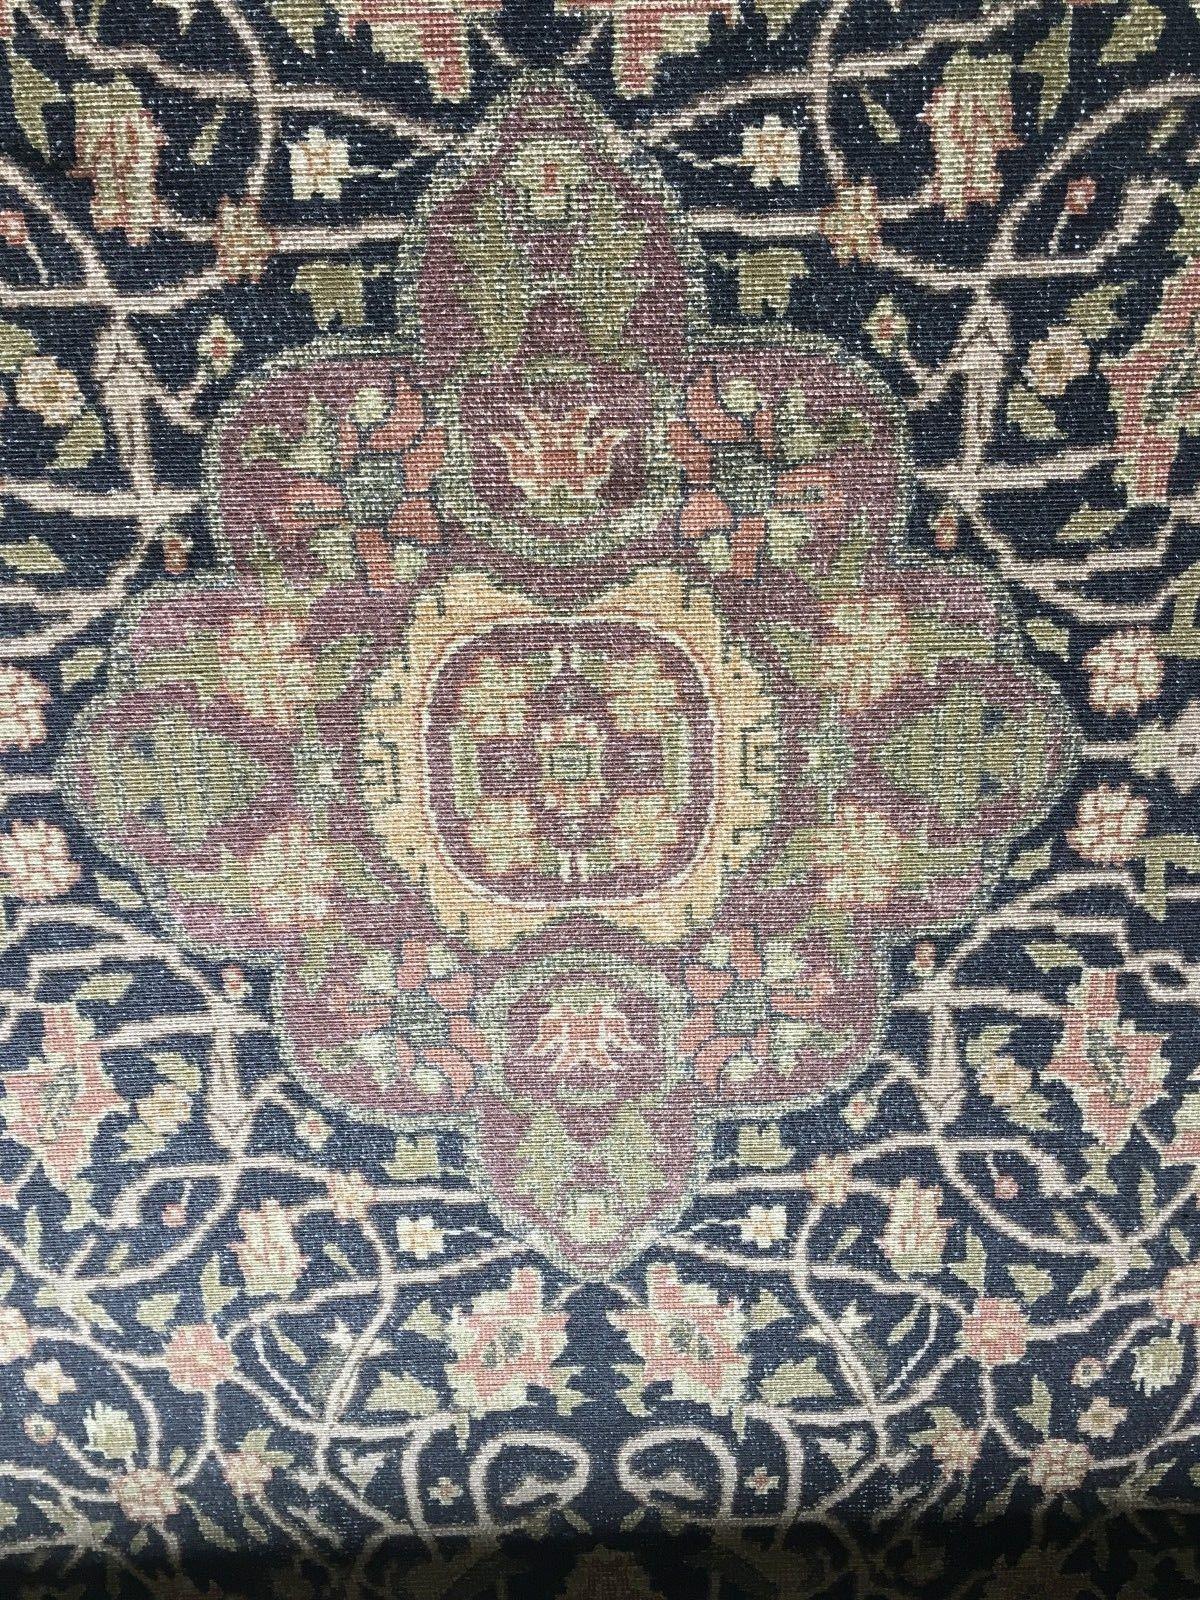 4 yds Ralph Lauren Upholstery Fabric Traditional Floral Print CK